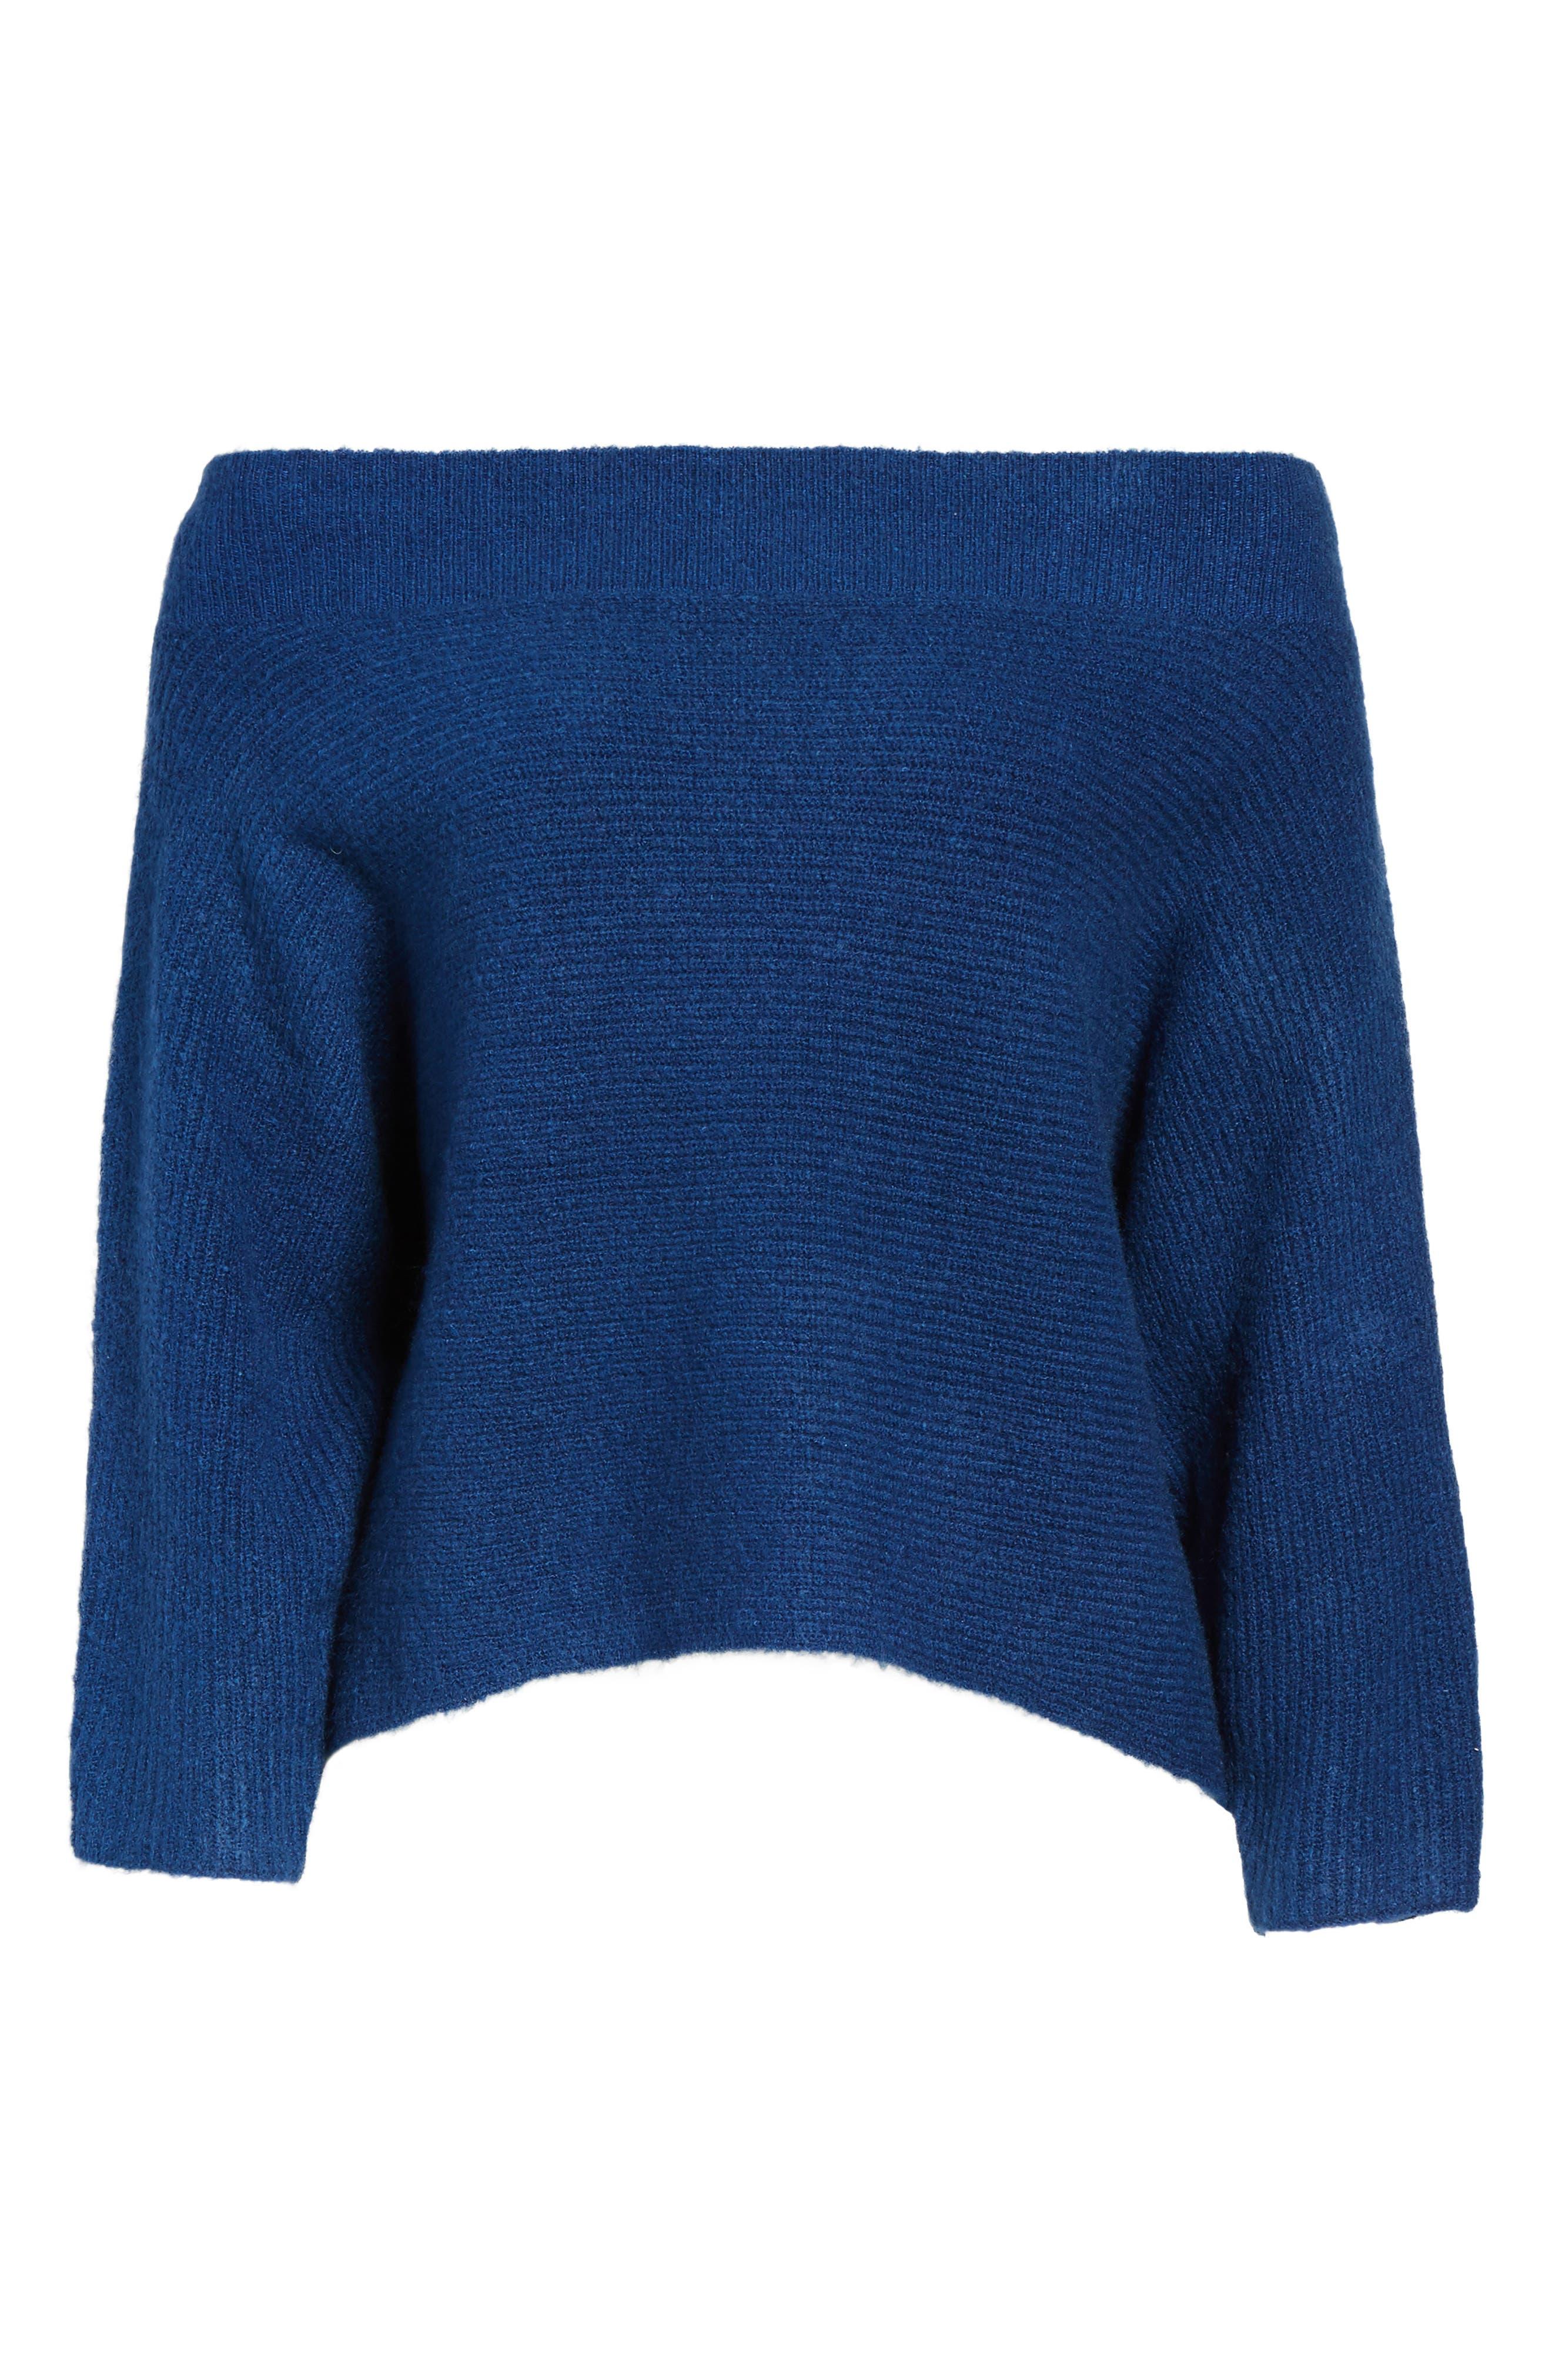 Dolman Sleeve Sweater,                             Alternate thumbnail 6, color,                             Blue Estate